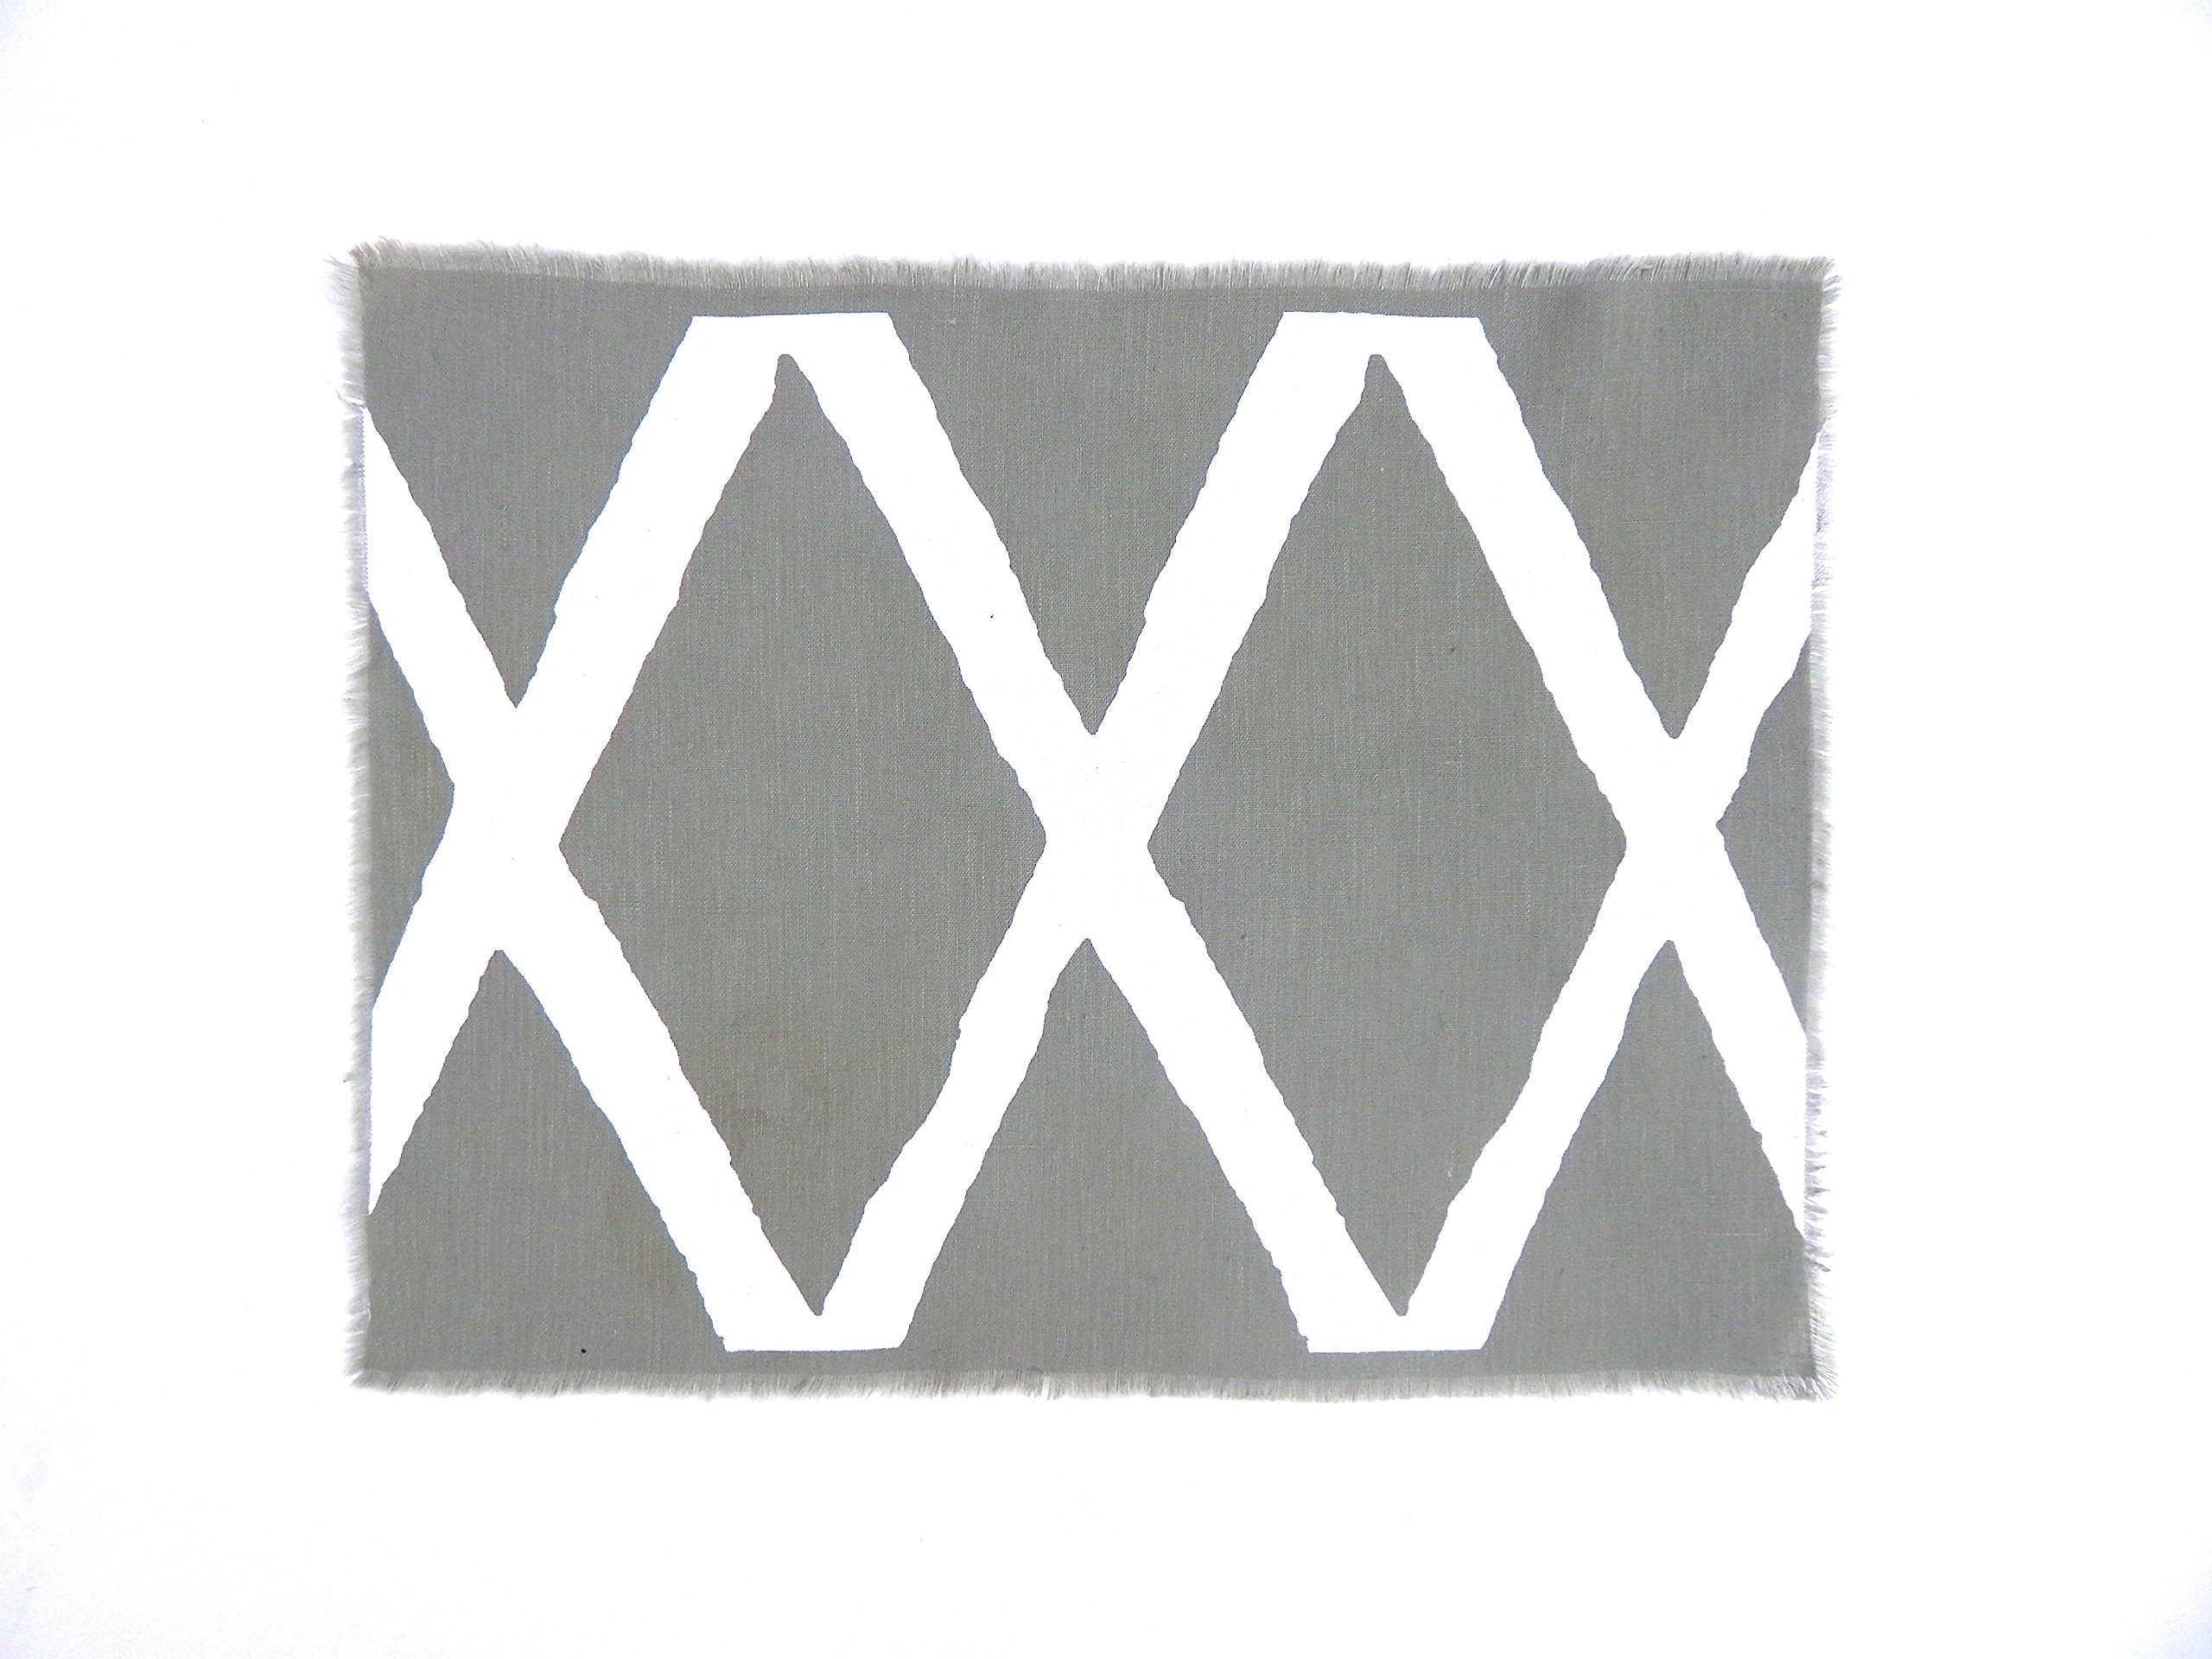 Gitika Goyal Home Windows Collection Cotton Khadi Grey Mat 17x12 Diamond Design, White Hand Screen Print